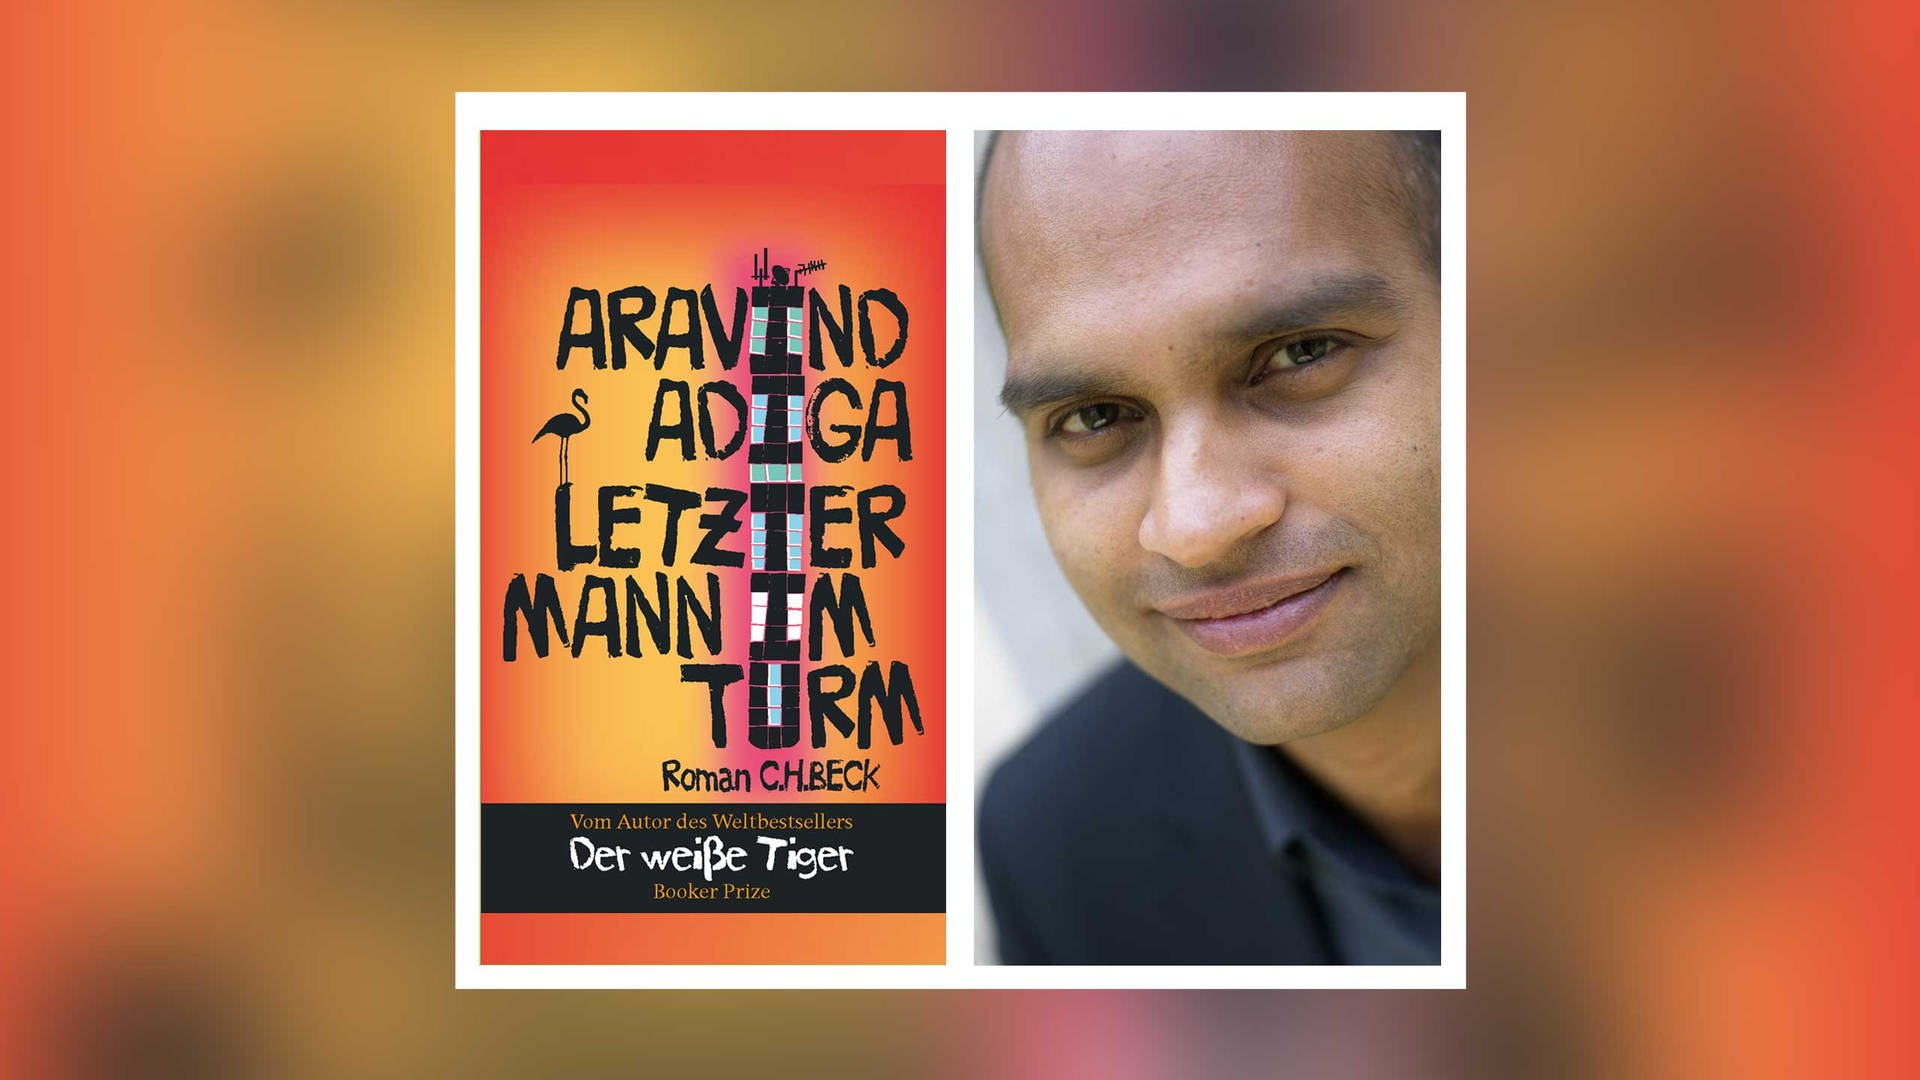 Adiga Aravind - Letzter Mann im Turm (4/21)